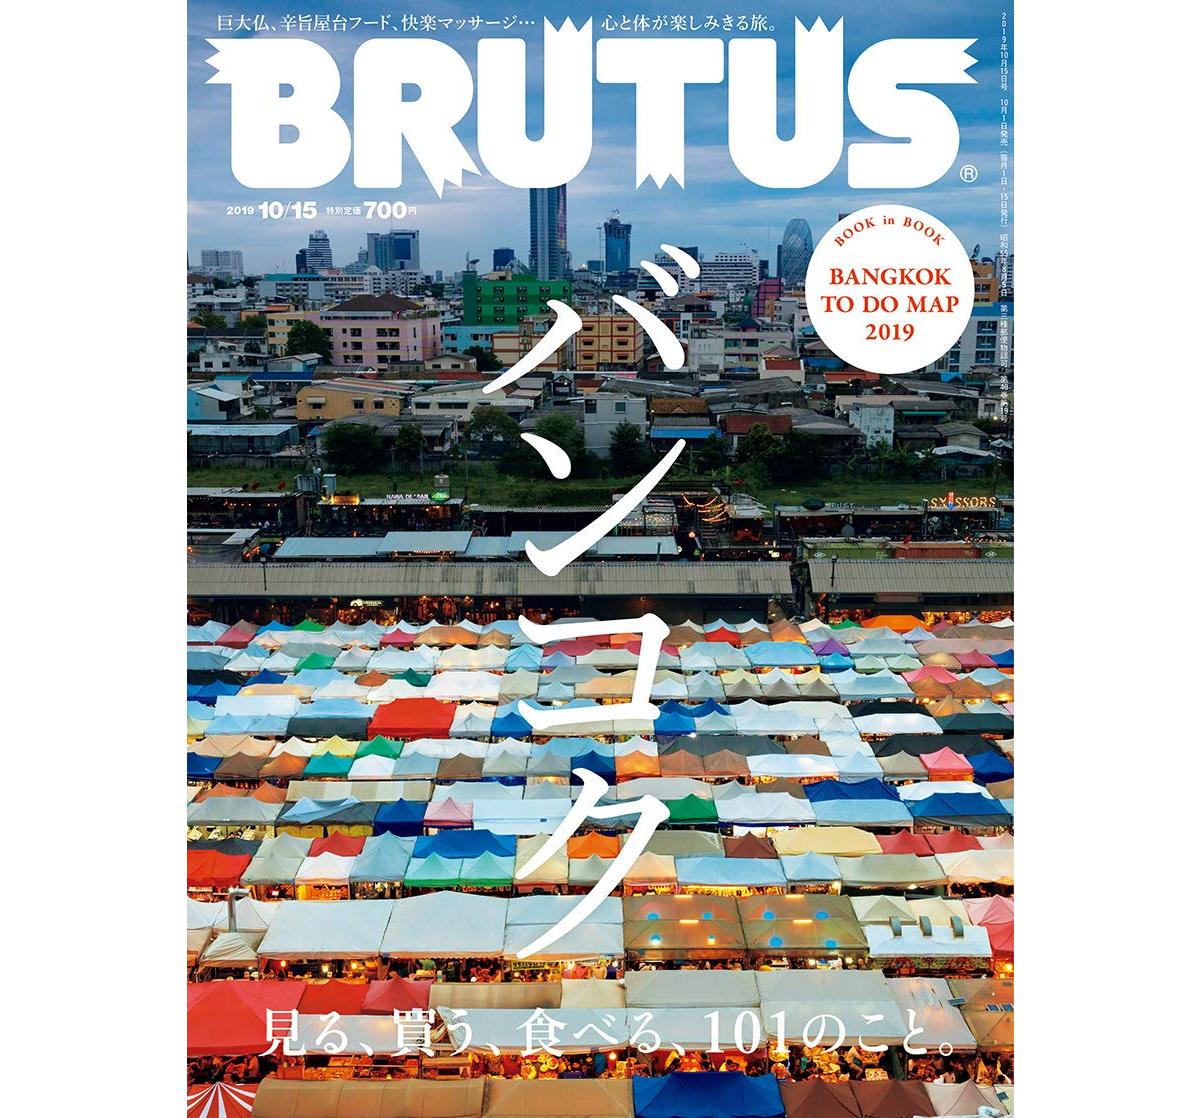 BRUTUS(ブルータス) 2019年10/15号No.902[バンコク 見る、買う、食べる、101のこと。] (日本語) 雑誌 – 2019/10/1